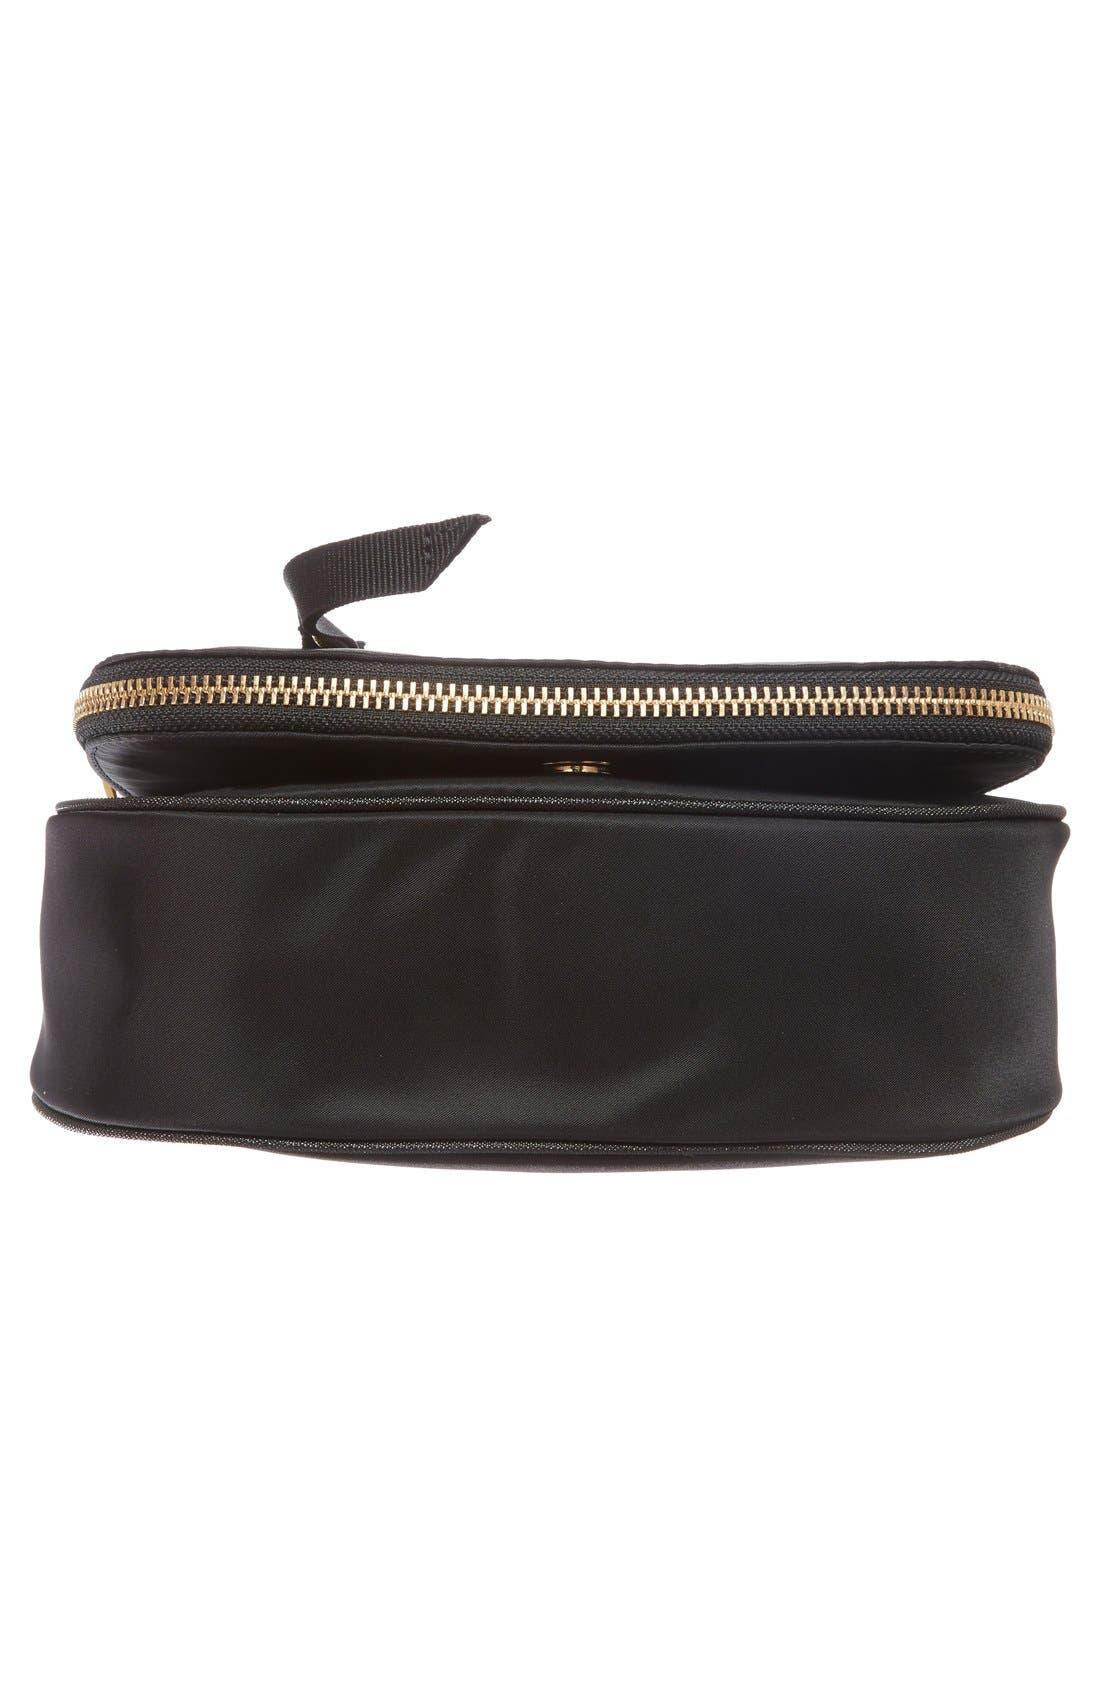 Trooper - Small Nomad Nylon Crossbody Bag,                             Alternate thumbnail 6, color,                             Black